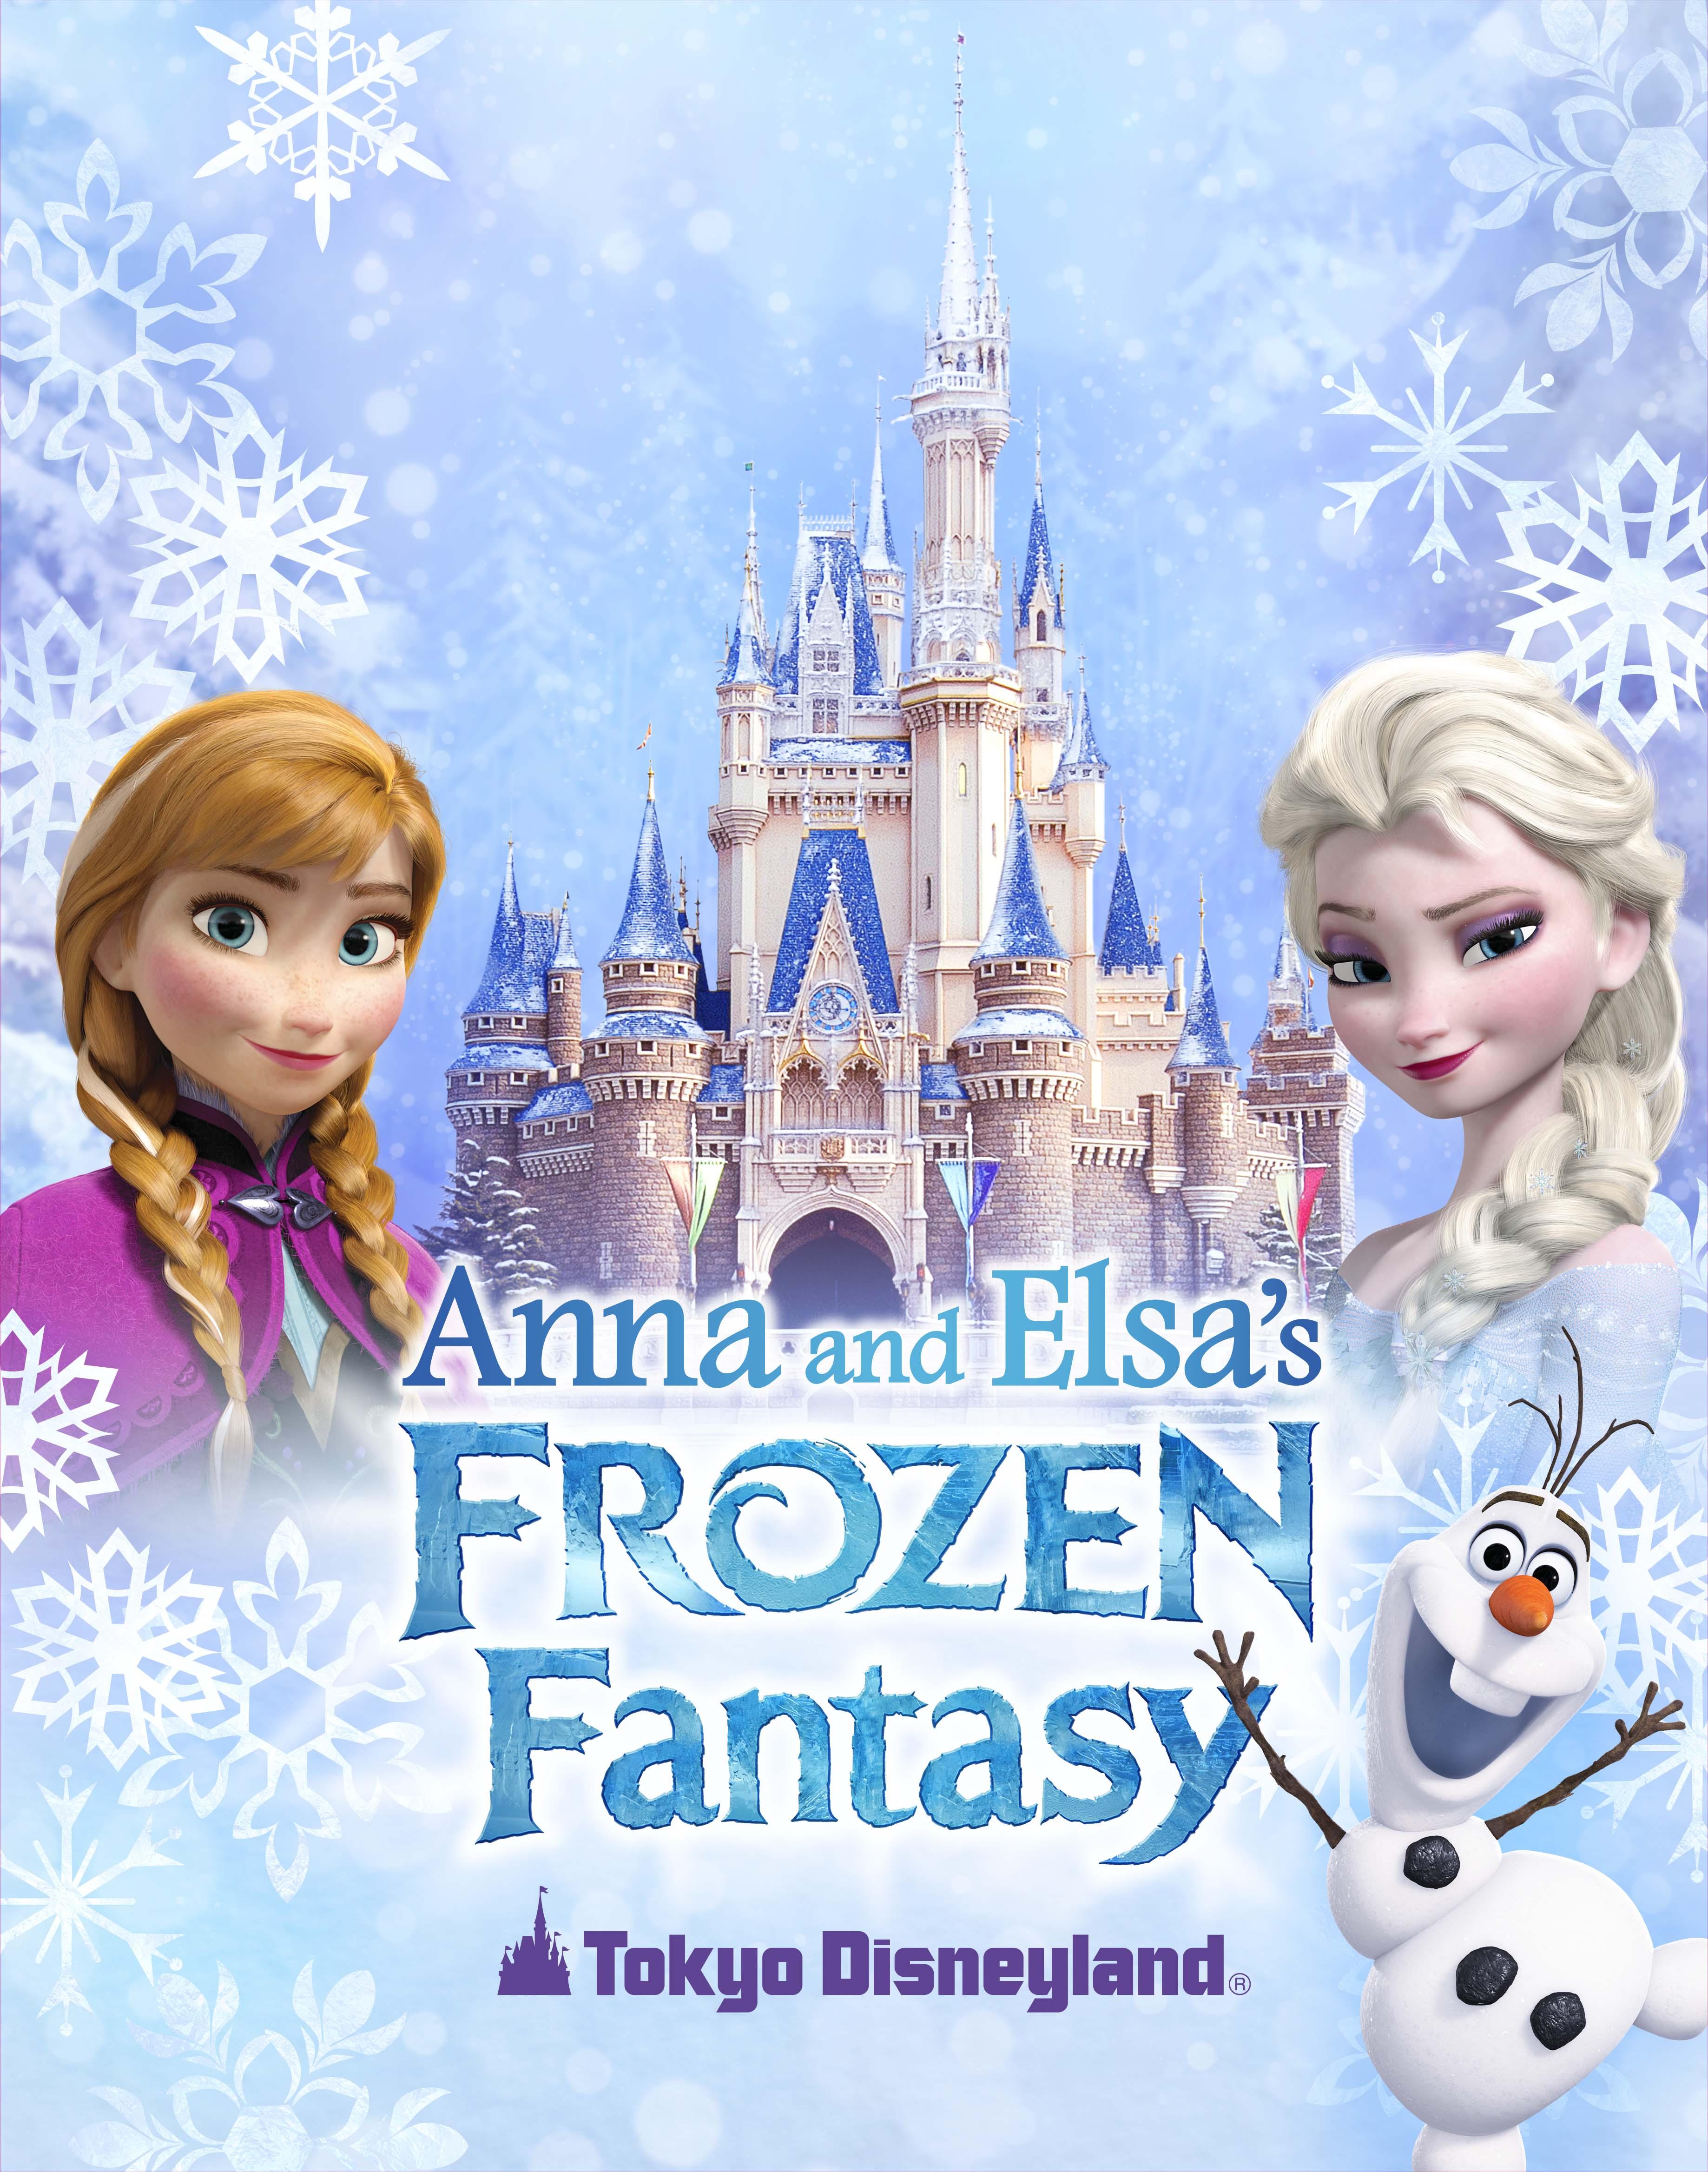 Anna And Elsa S Frozen Fantasy Coming To Tokyo Disney Resort Disney Parks Blog